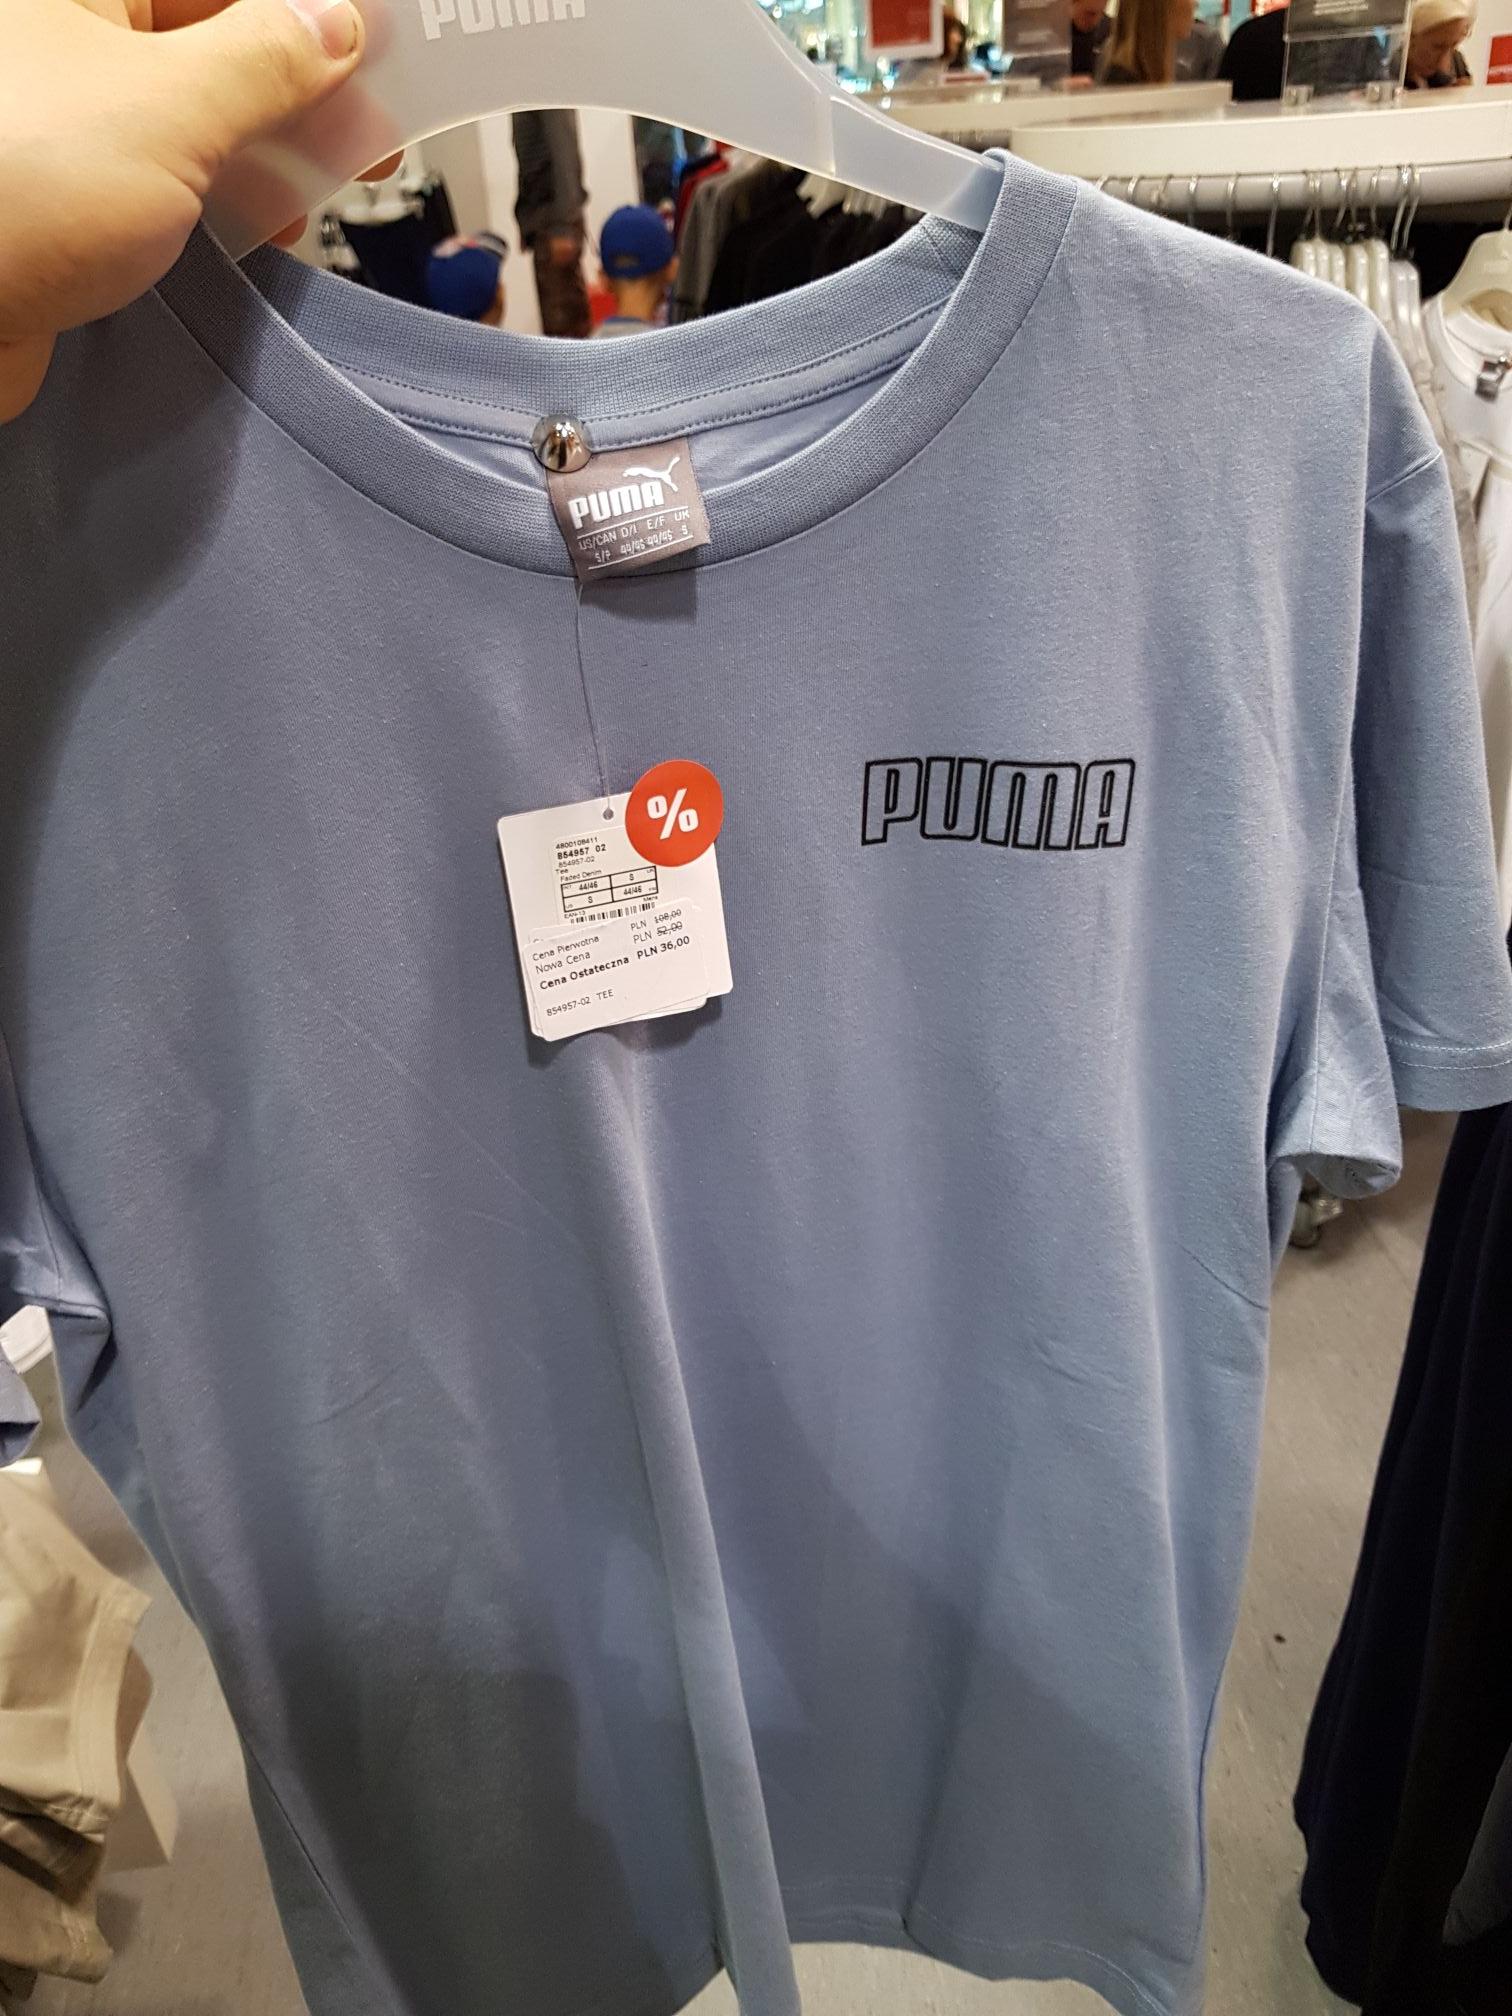 T-shirty Puma w Ursus Factory Warszawa